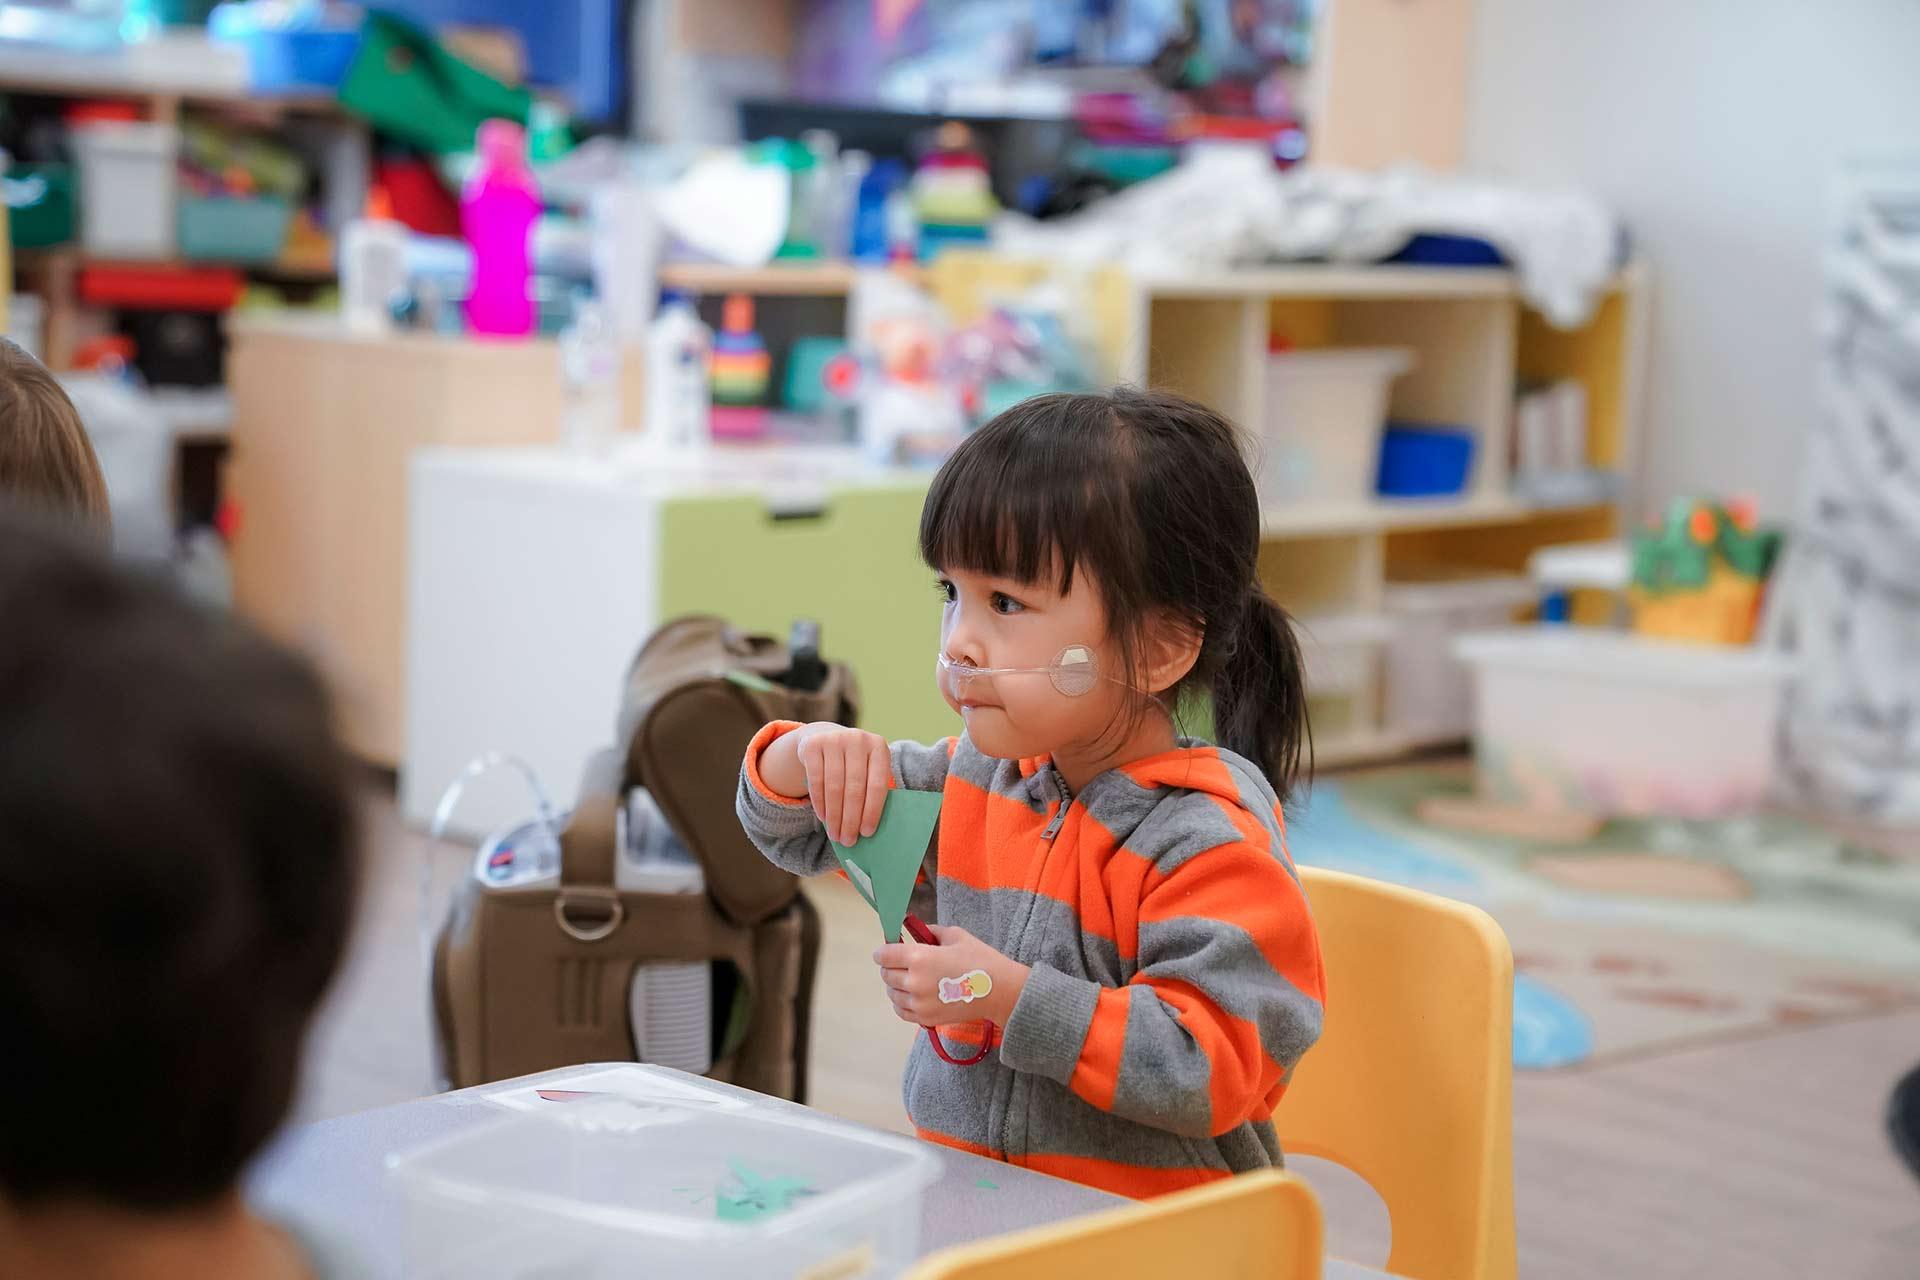 Special Needs Child Using Scissors